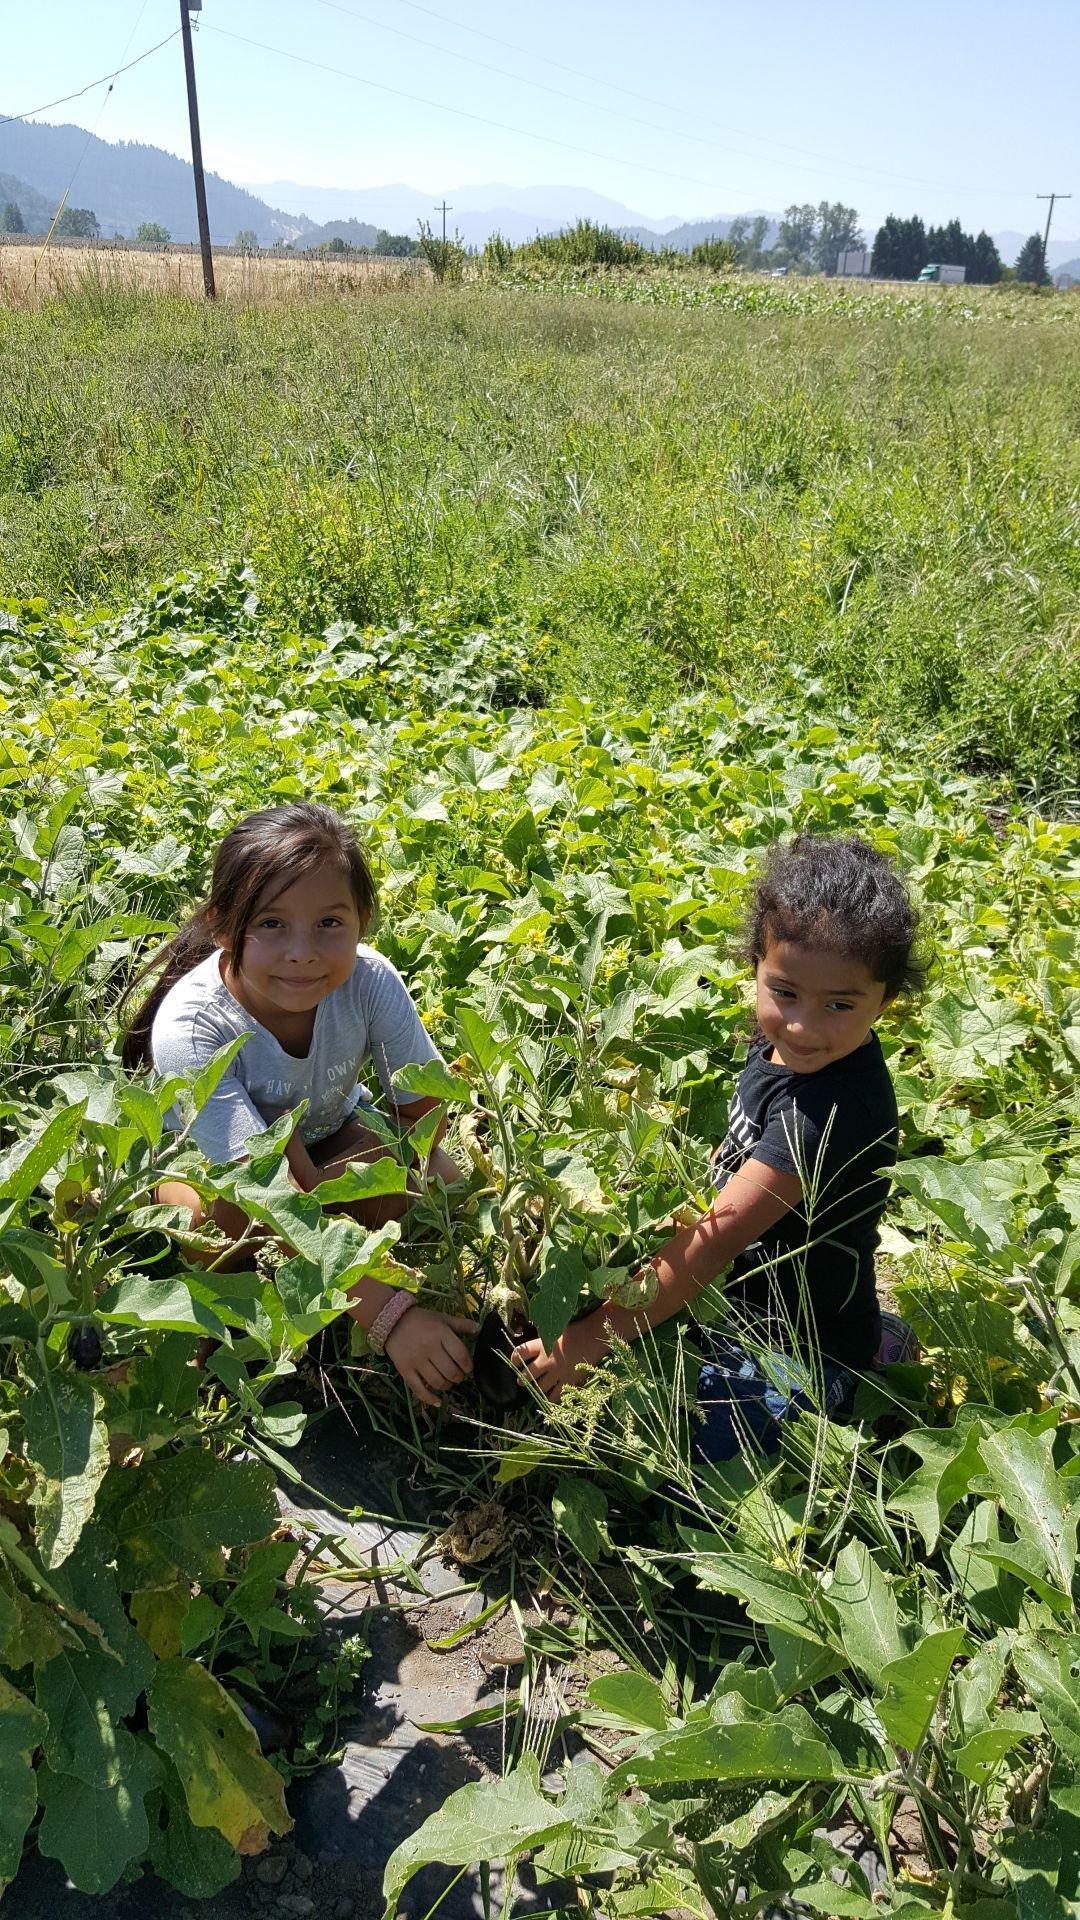 Katalina and Mayte Valadez showing off an eggplant